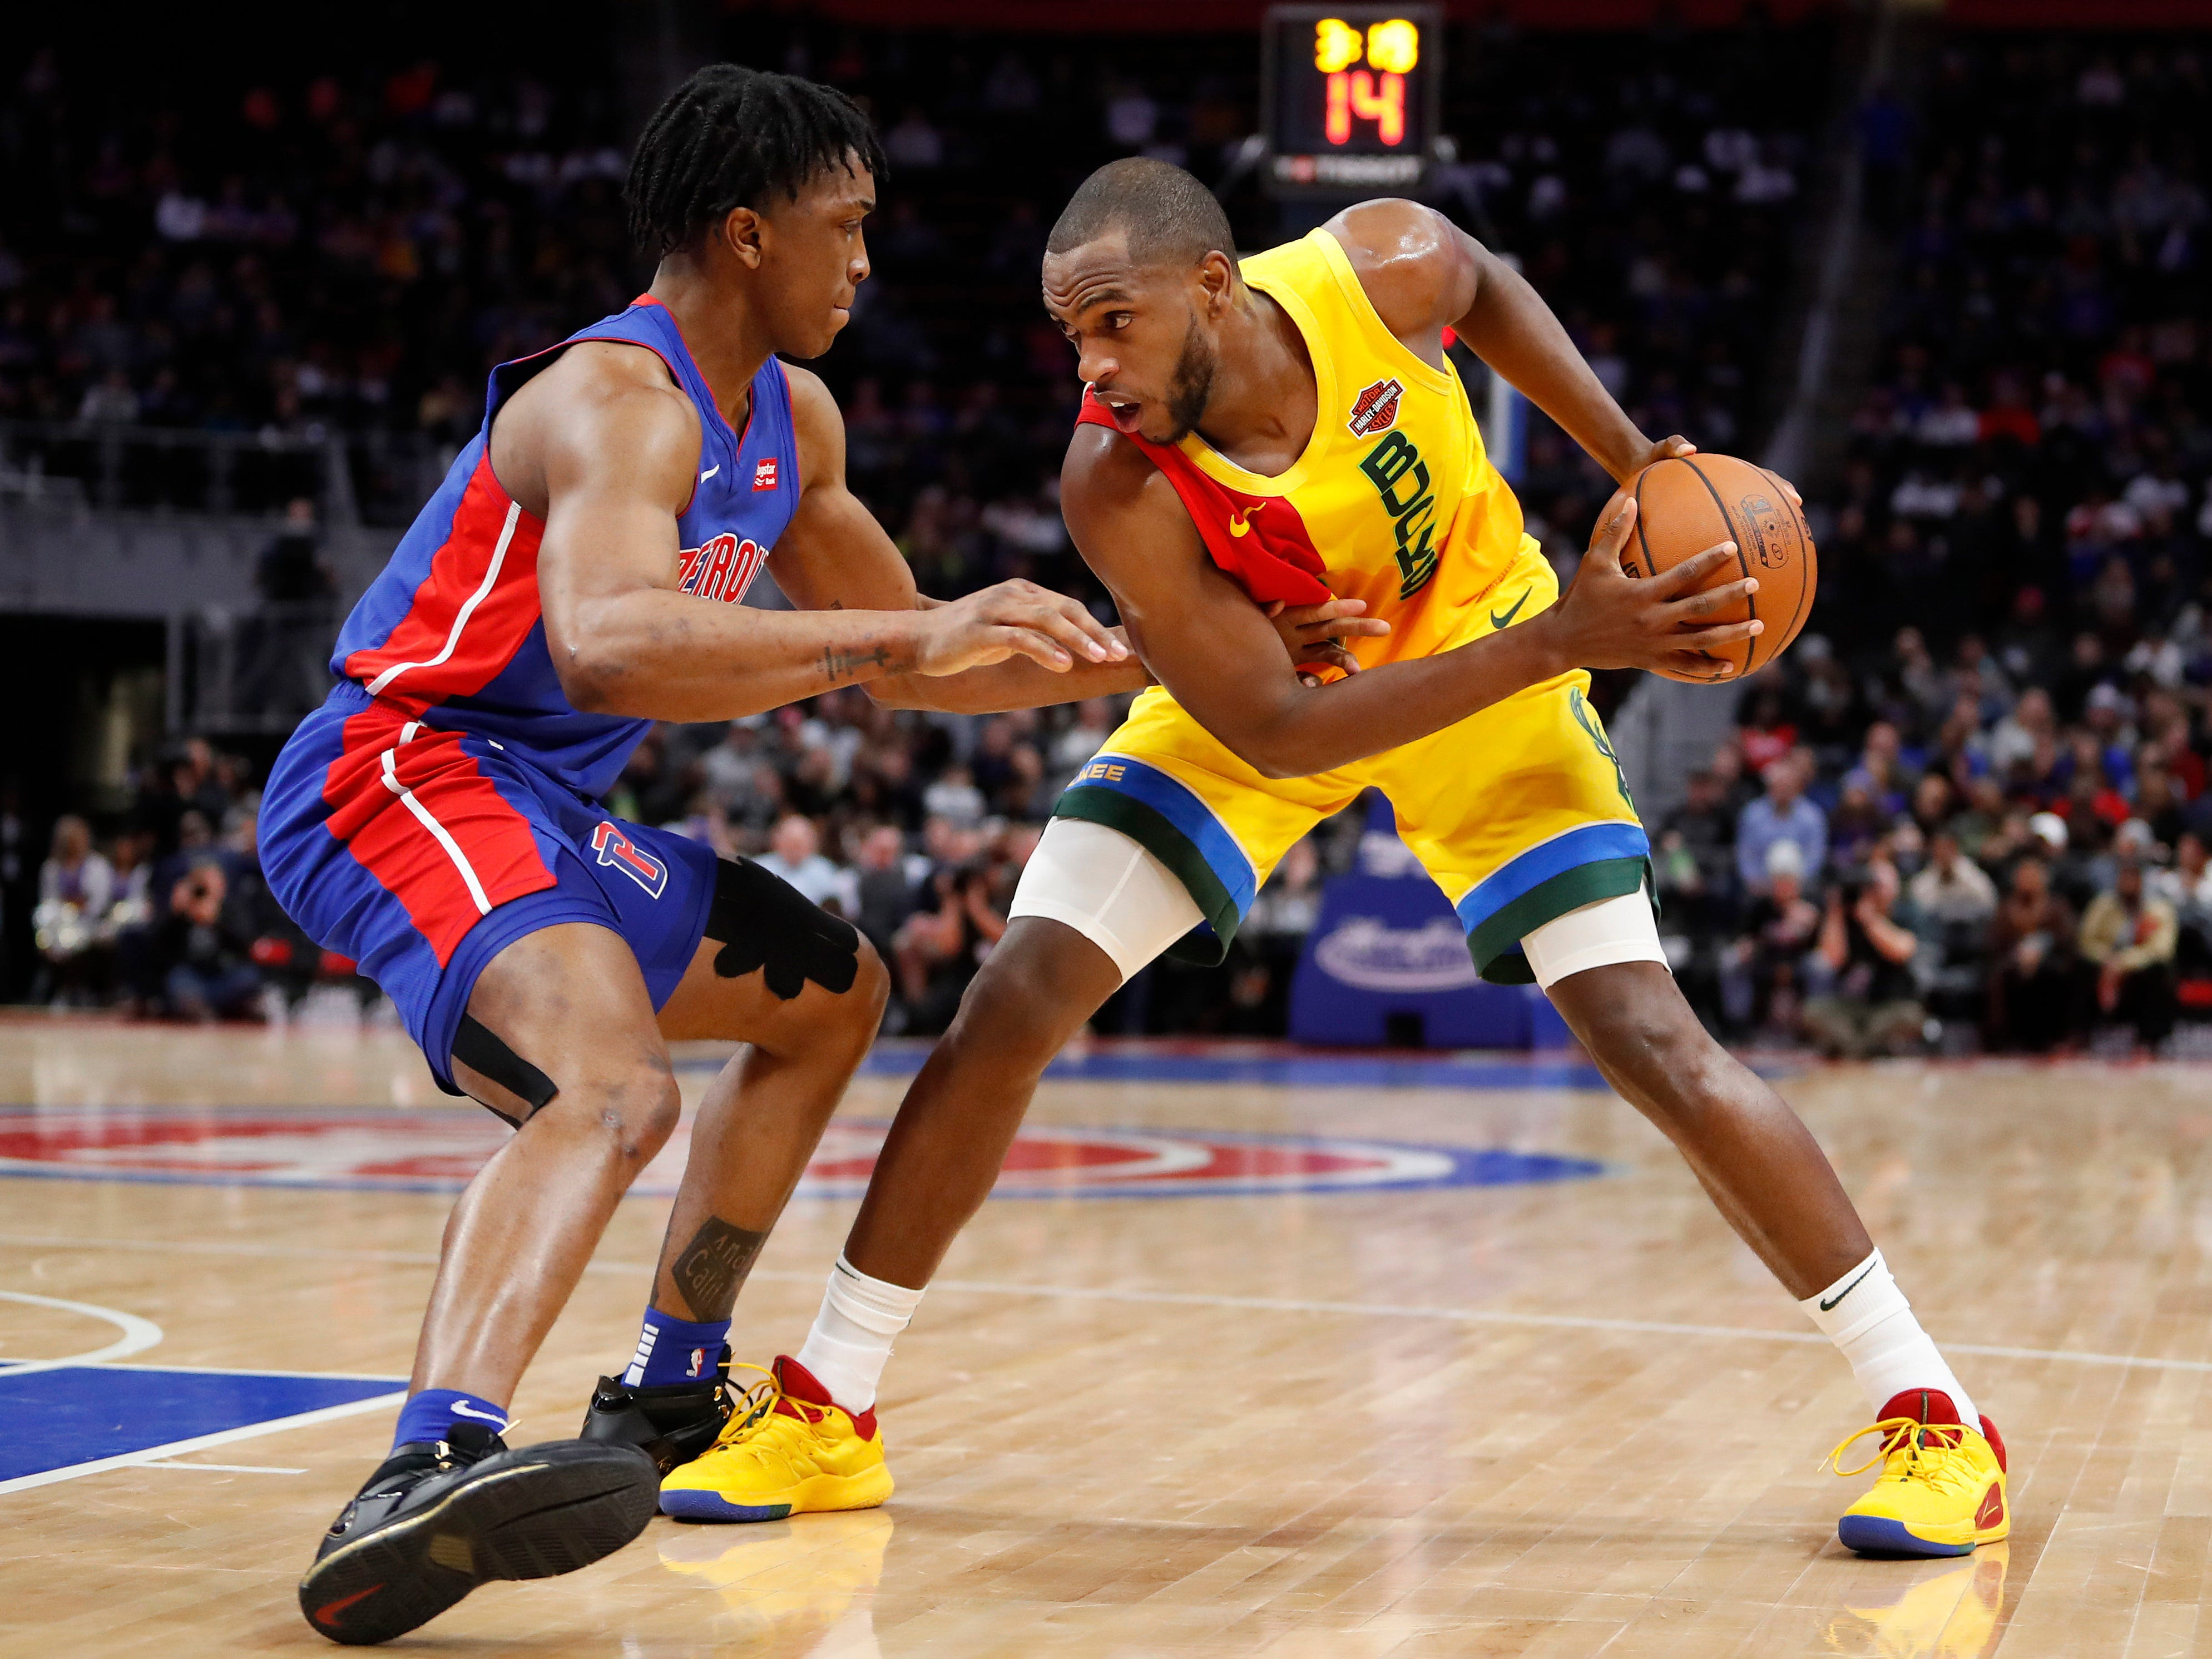 Bucks forward Khris Middleton looks to find a way around Detroit's Stanley Johnson.